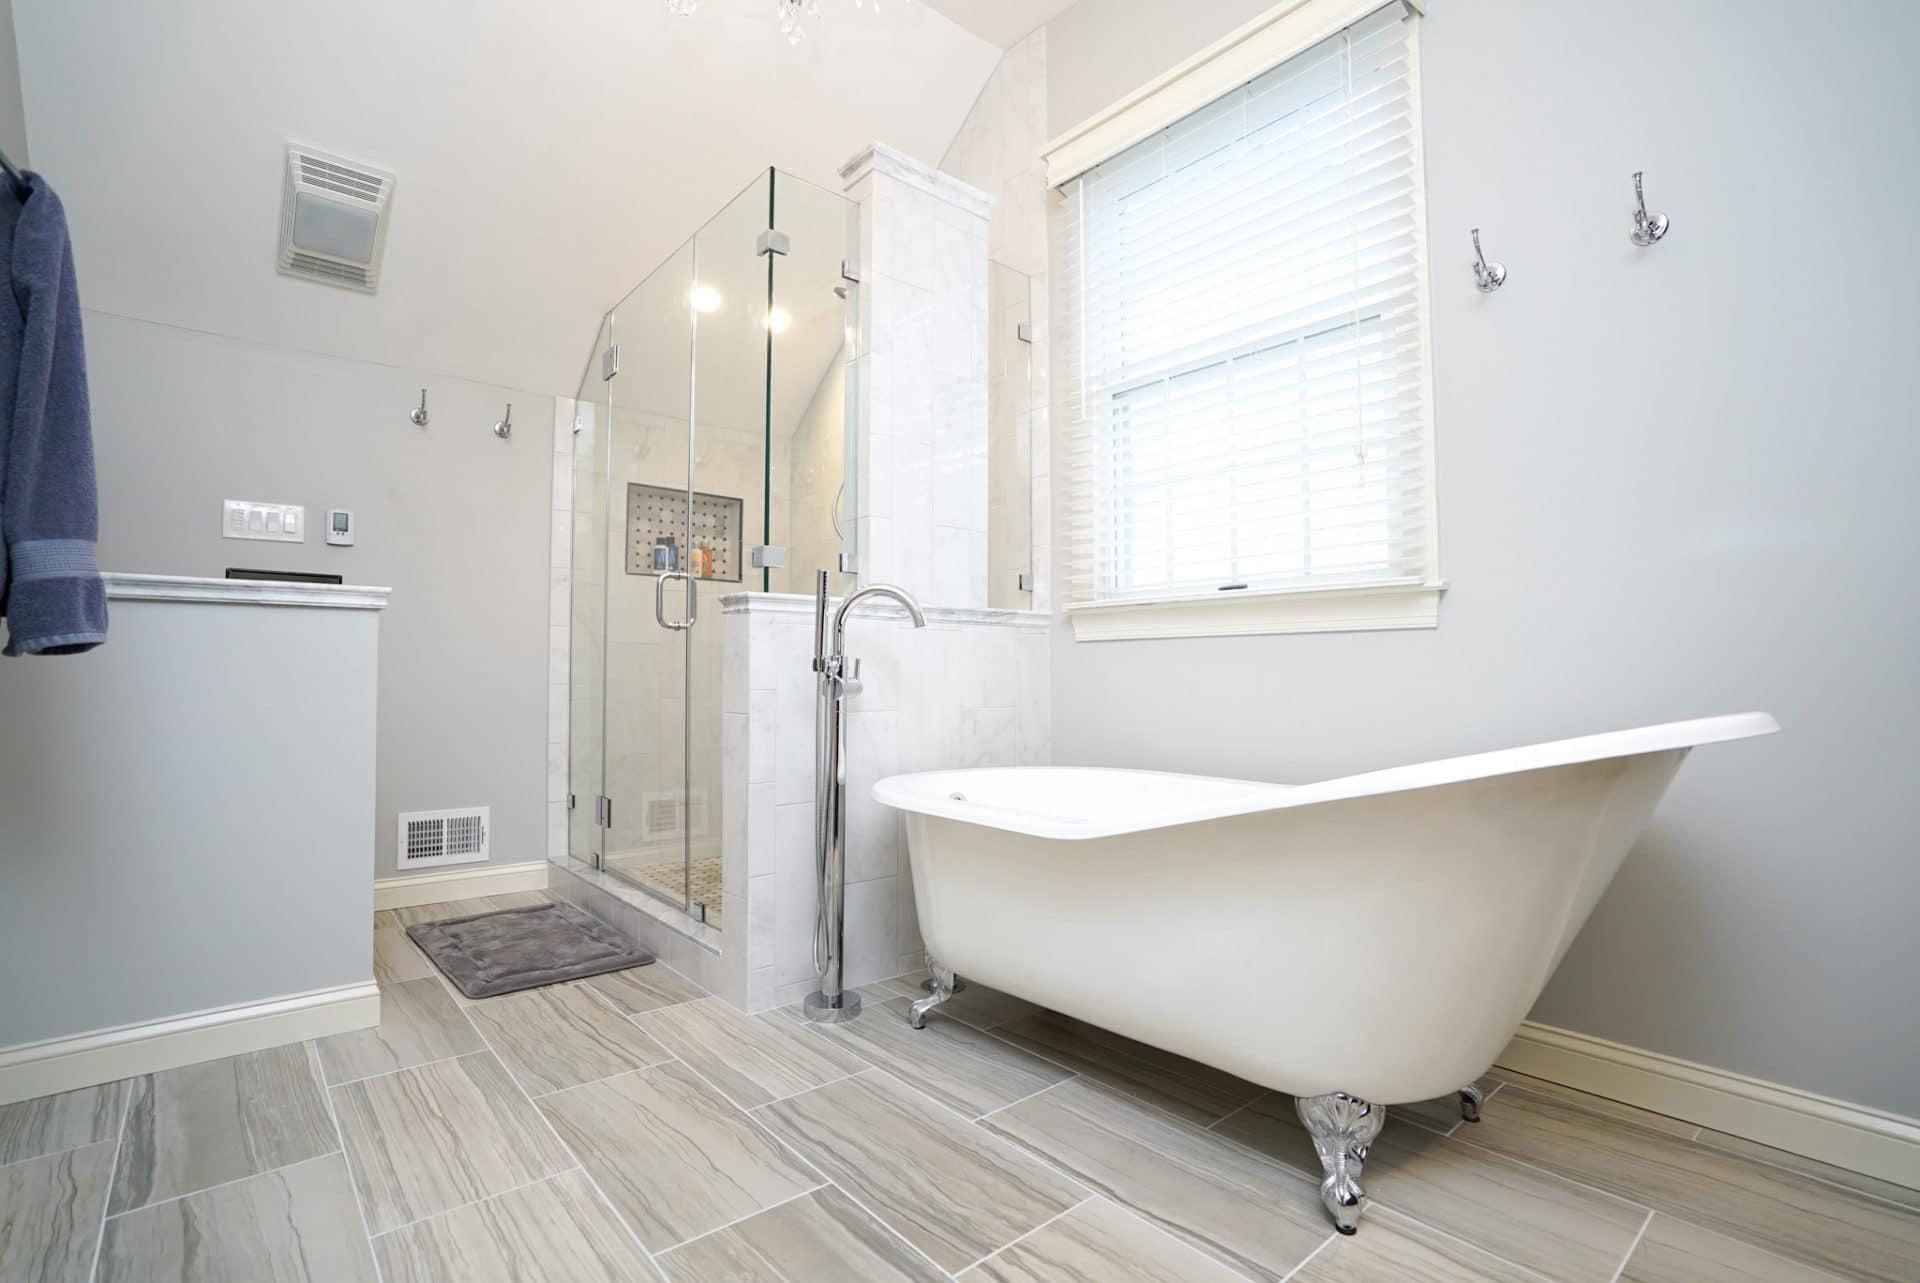 Bathroom remodel with laminate floor